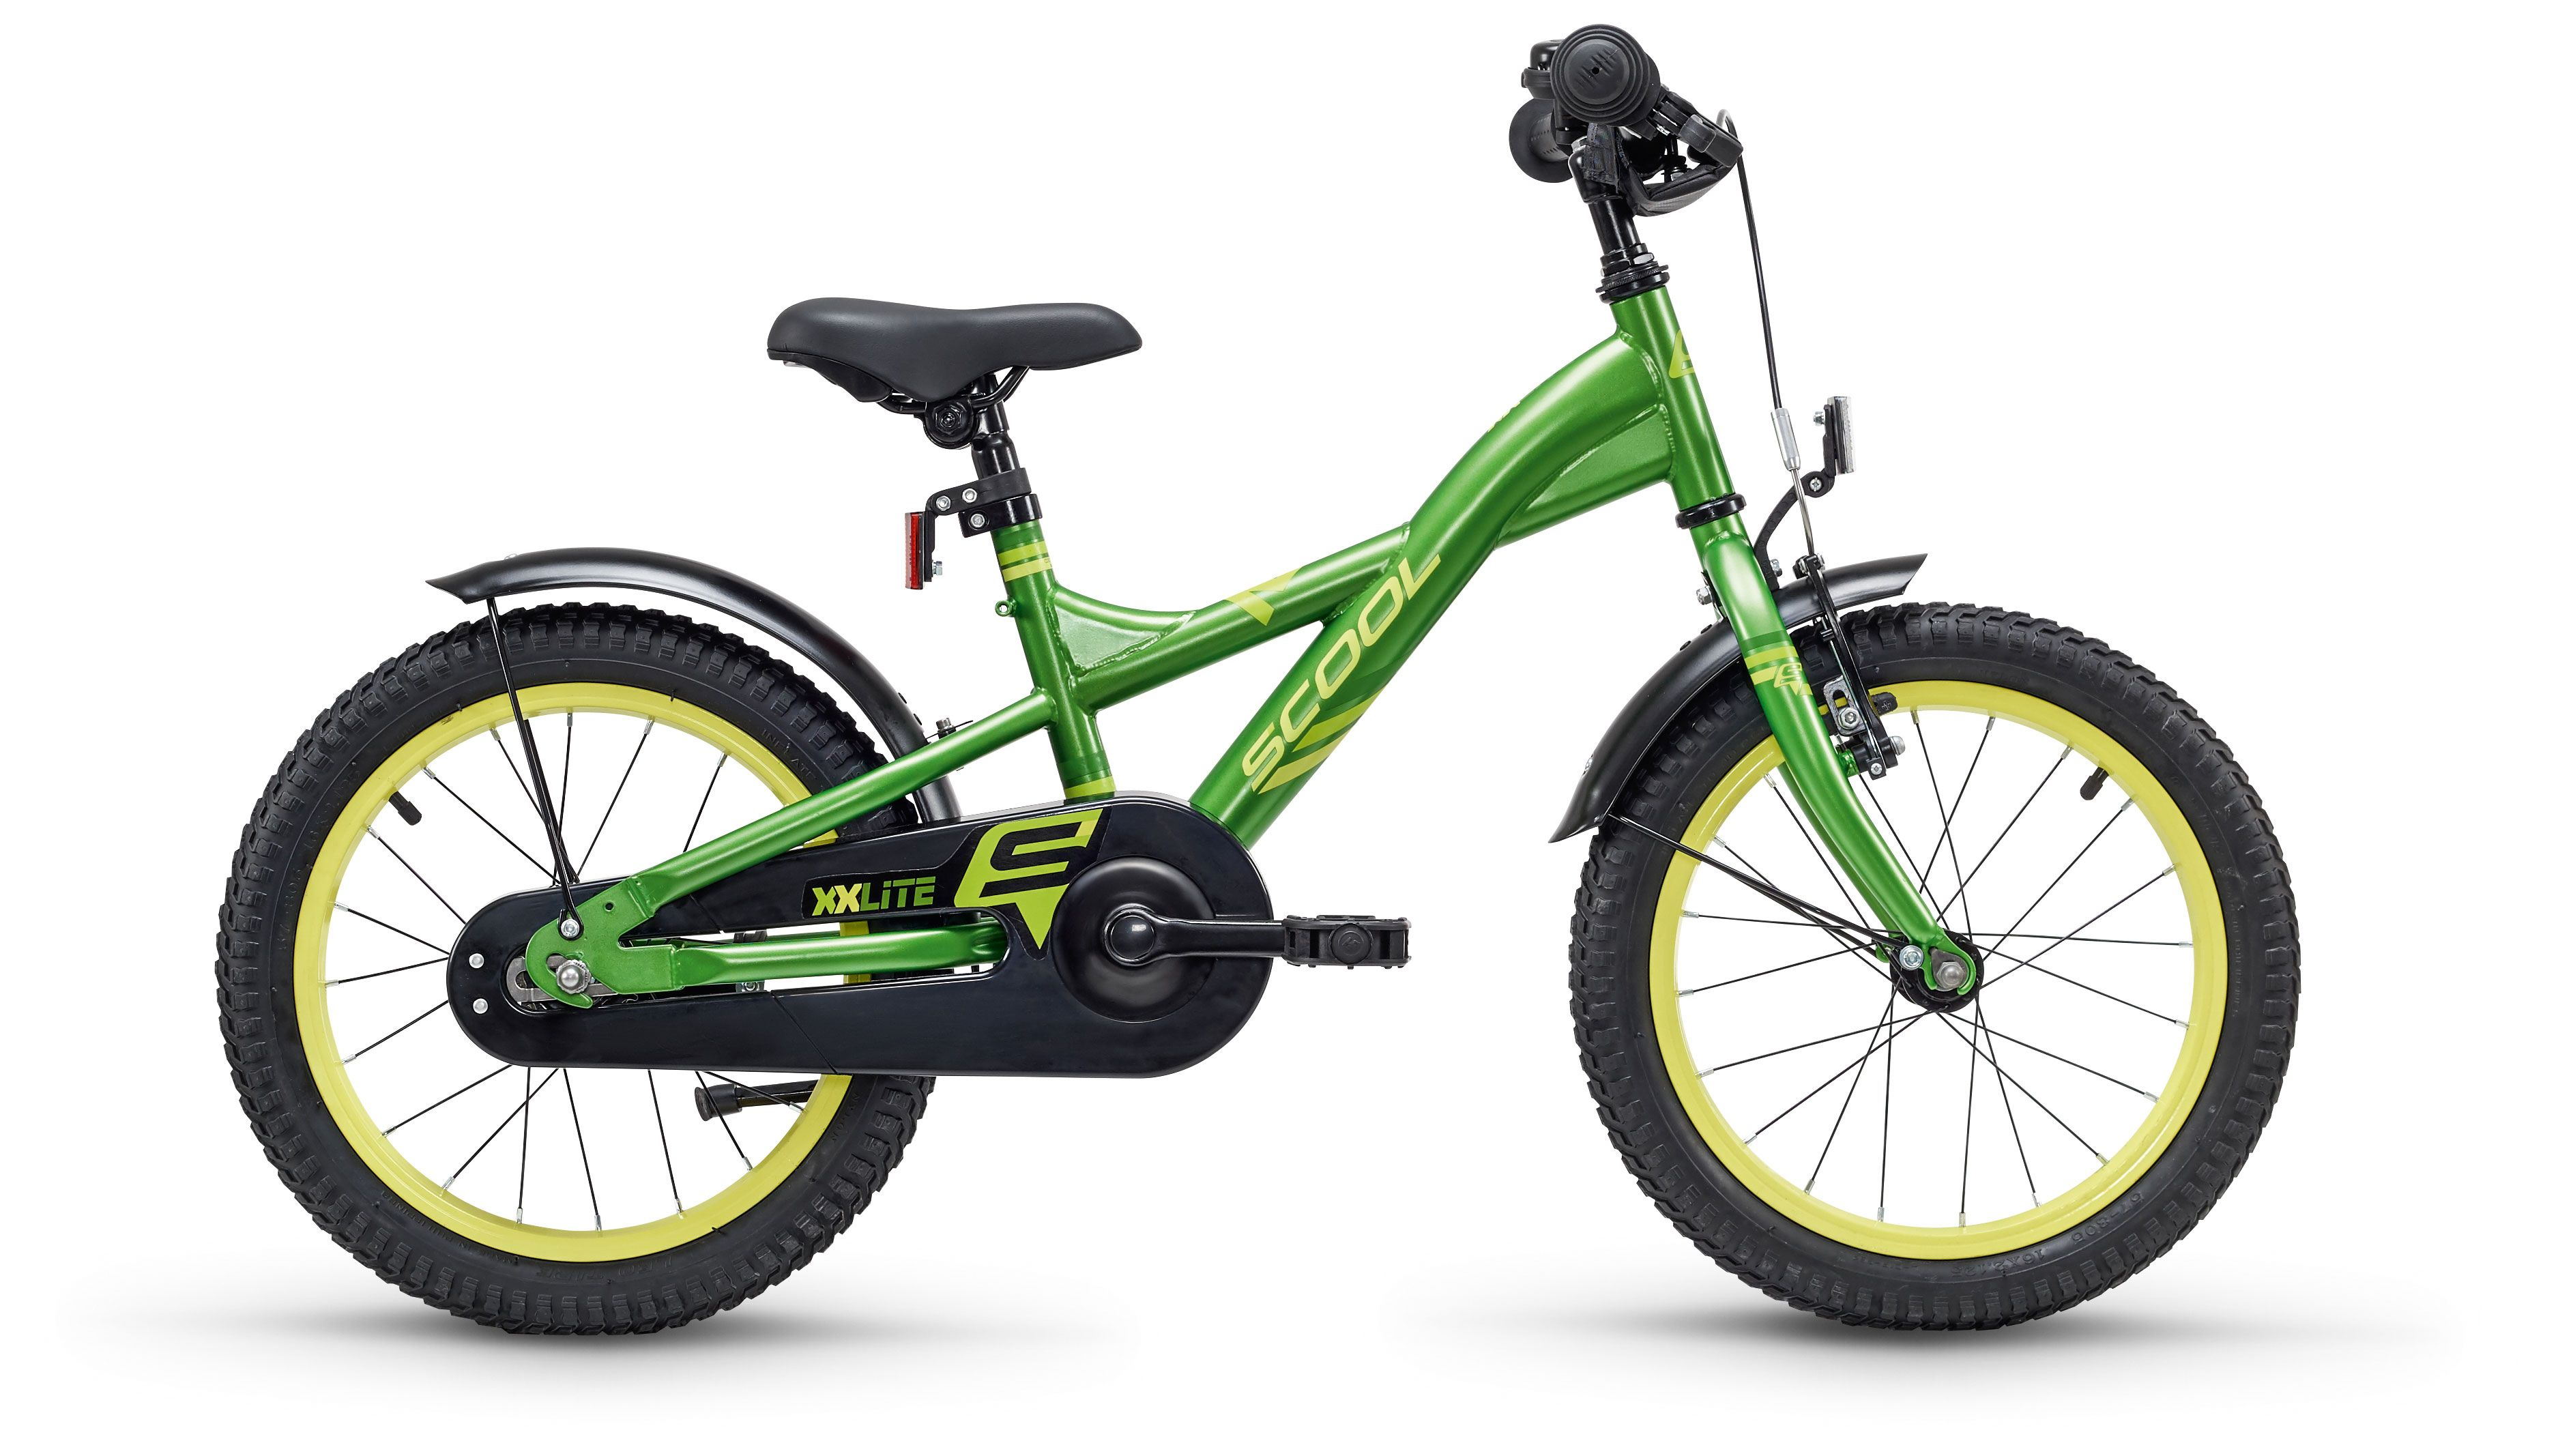 купить Велосипед Scool XXlite steel 16 1-S 2018 по цене 11970 рублей